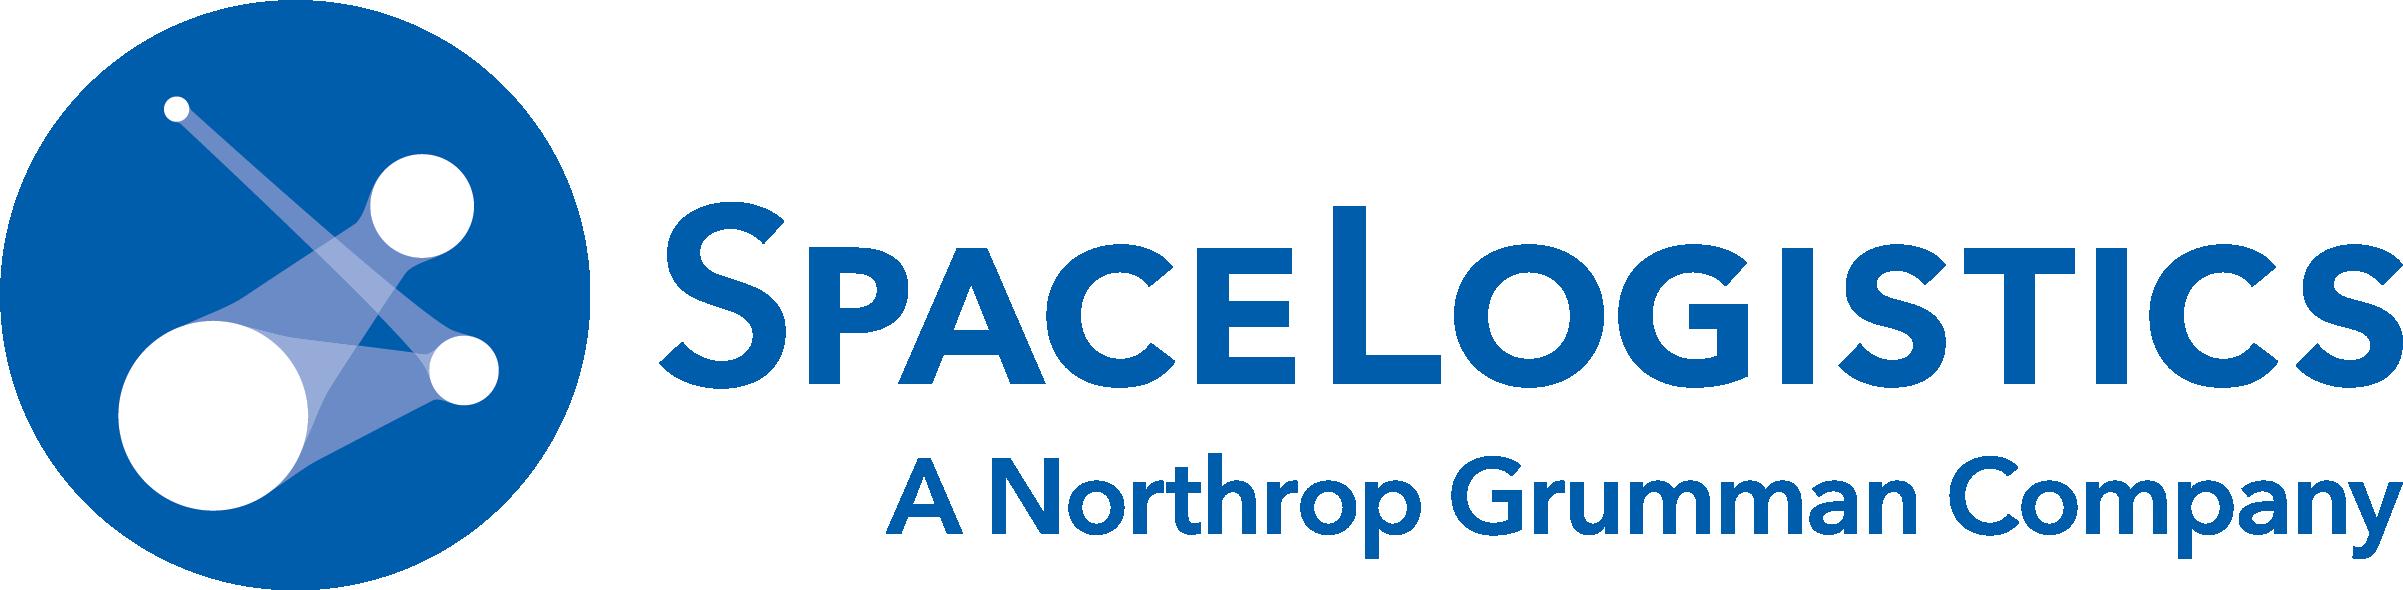 Space Logistics: A Northrop Grumman Company